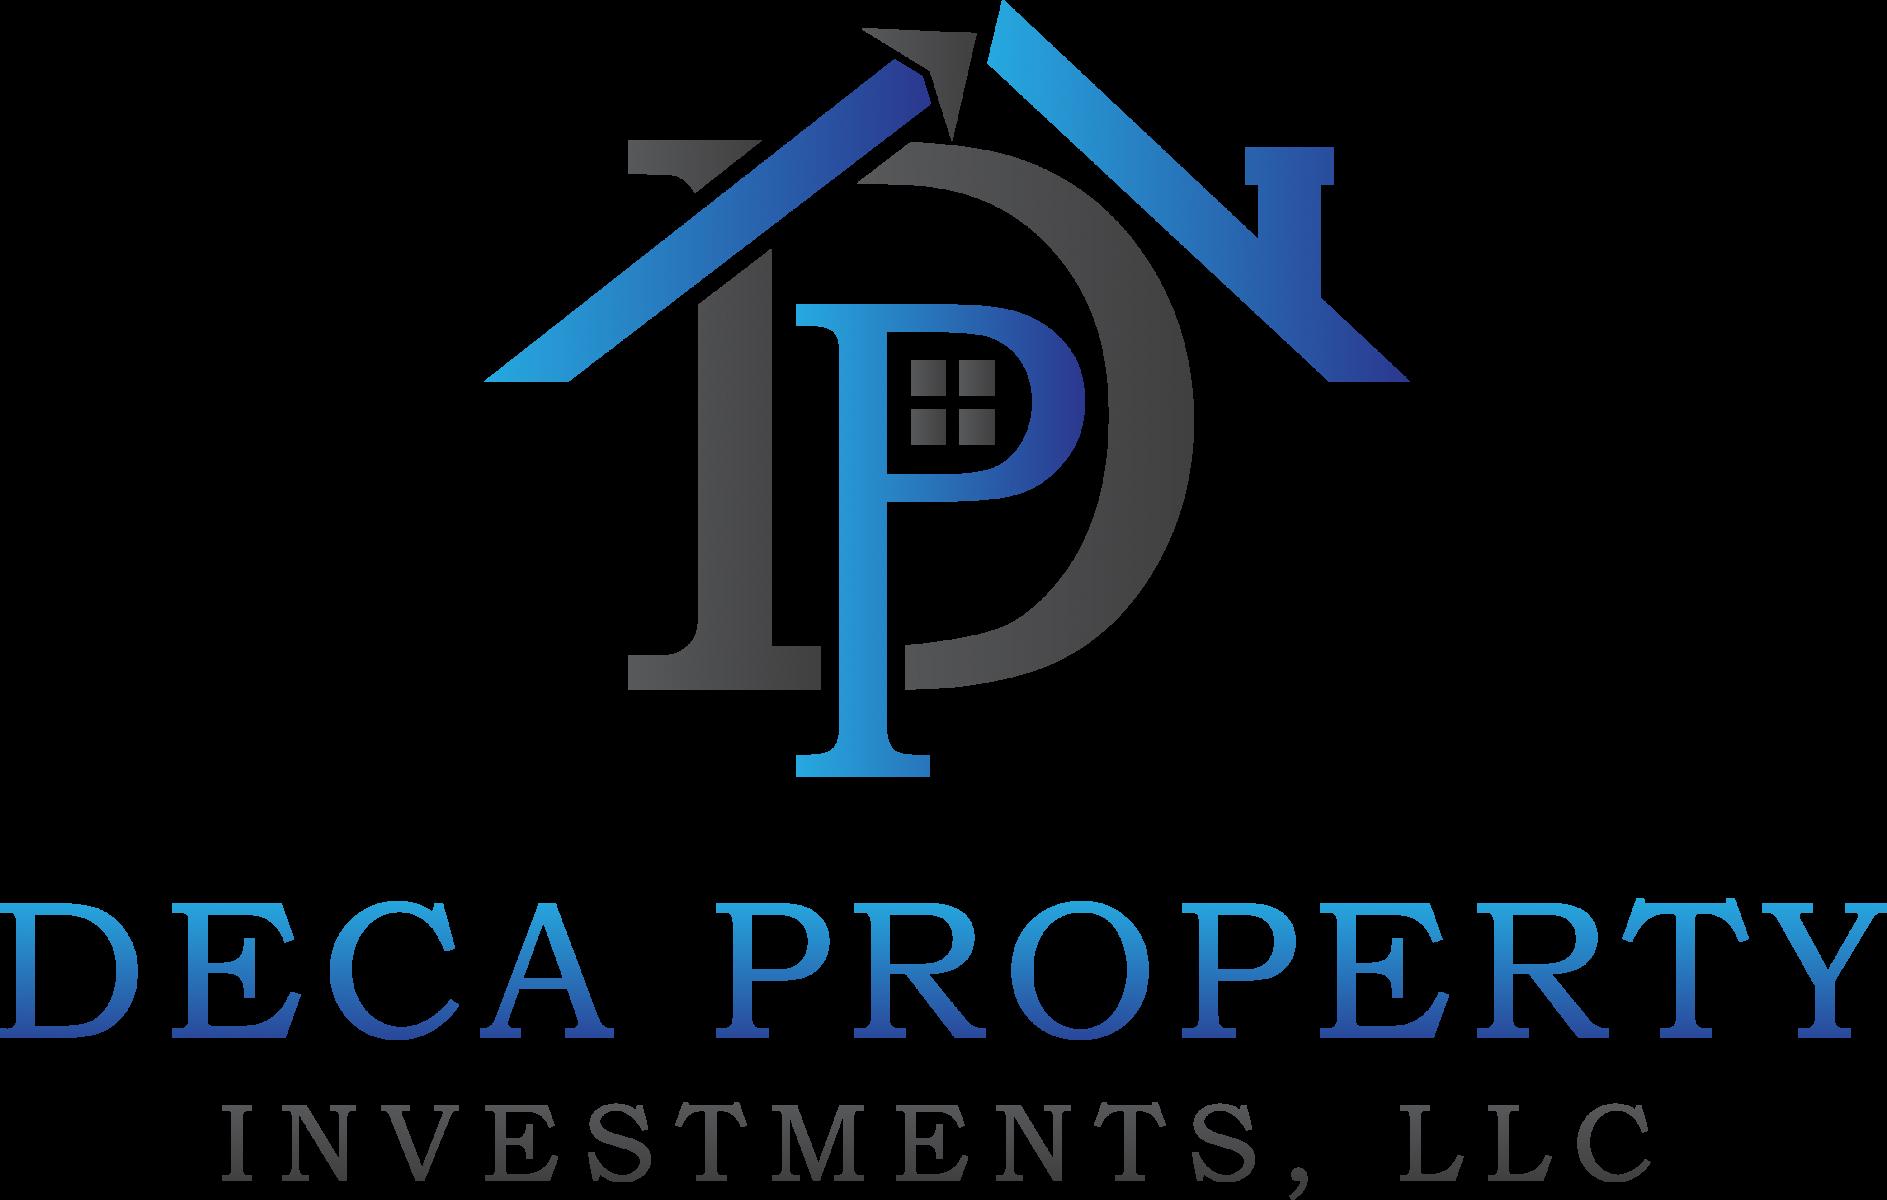 Deca Property Investments, LLC logo